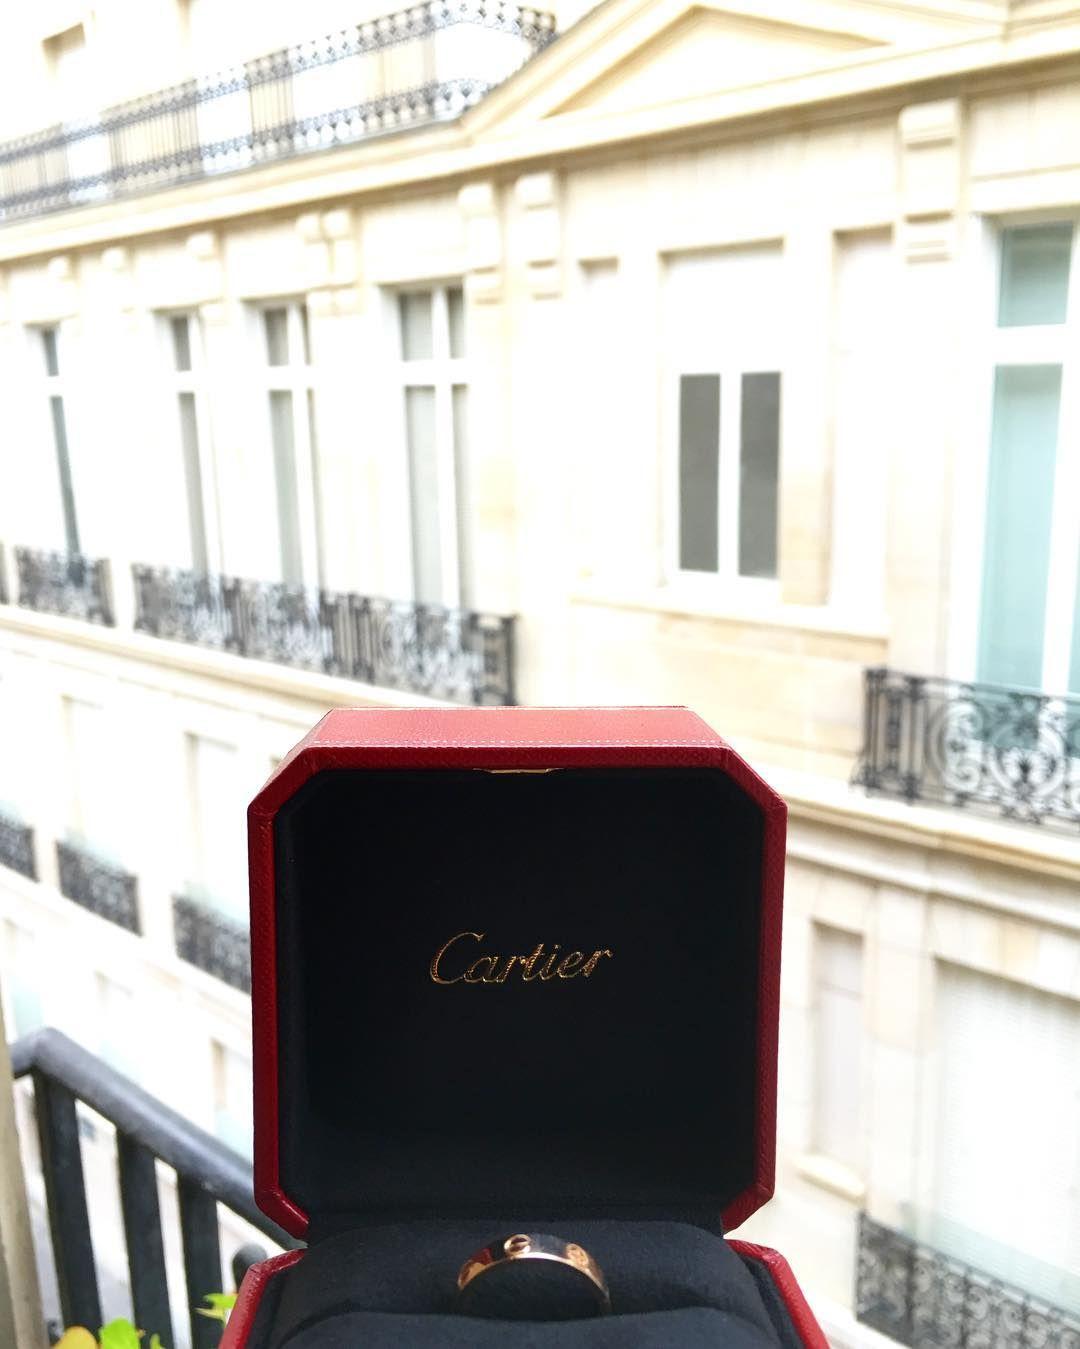 Paris Cartier